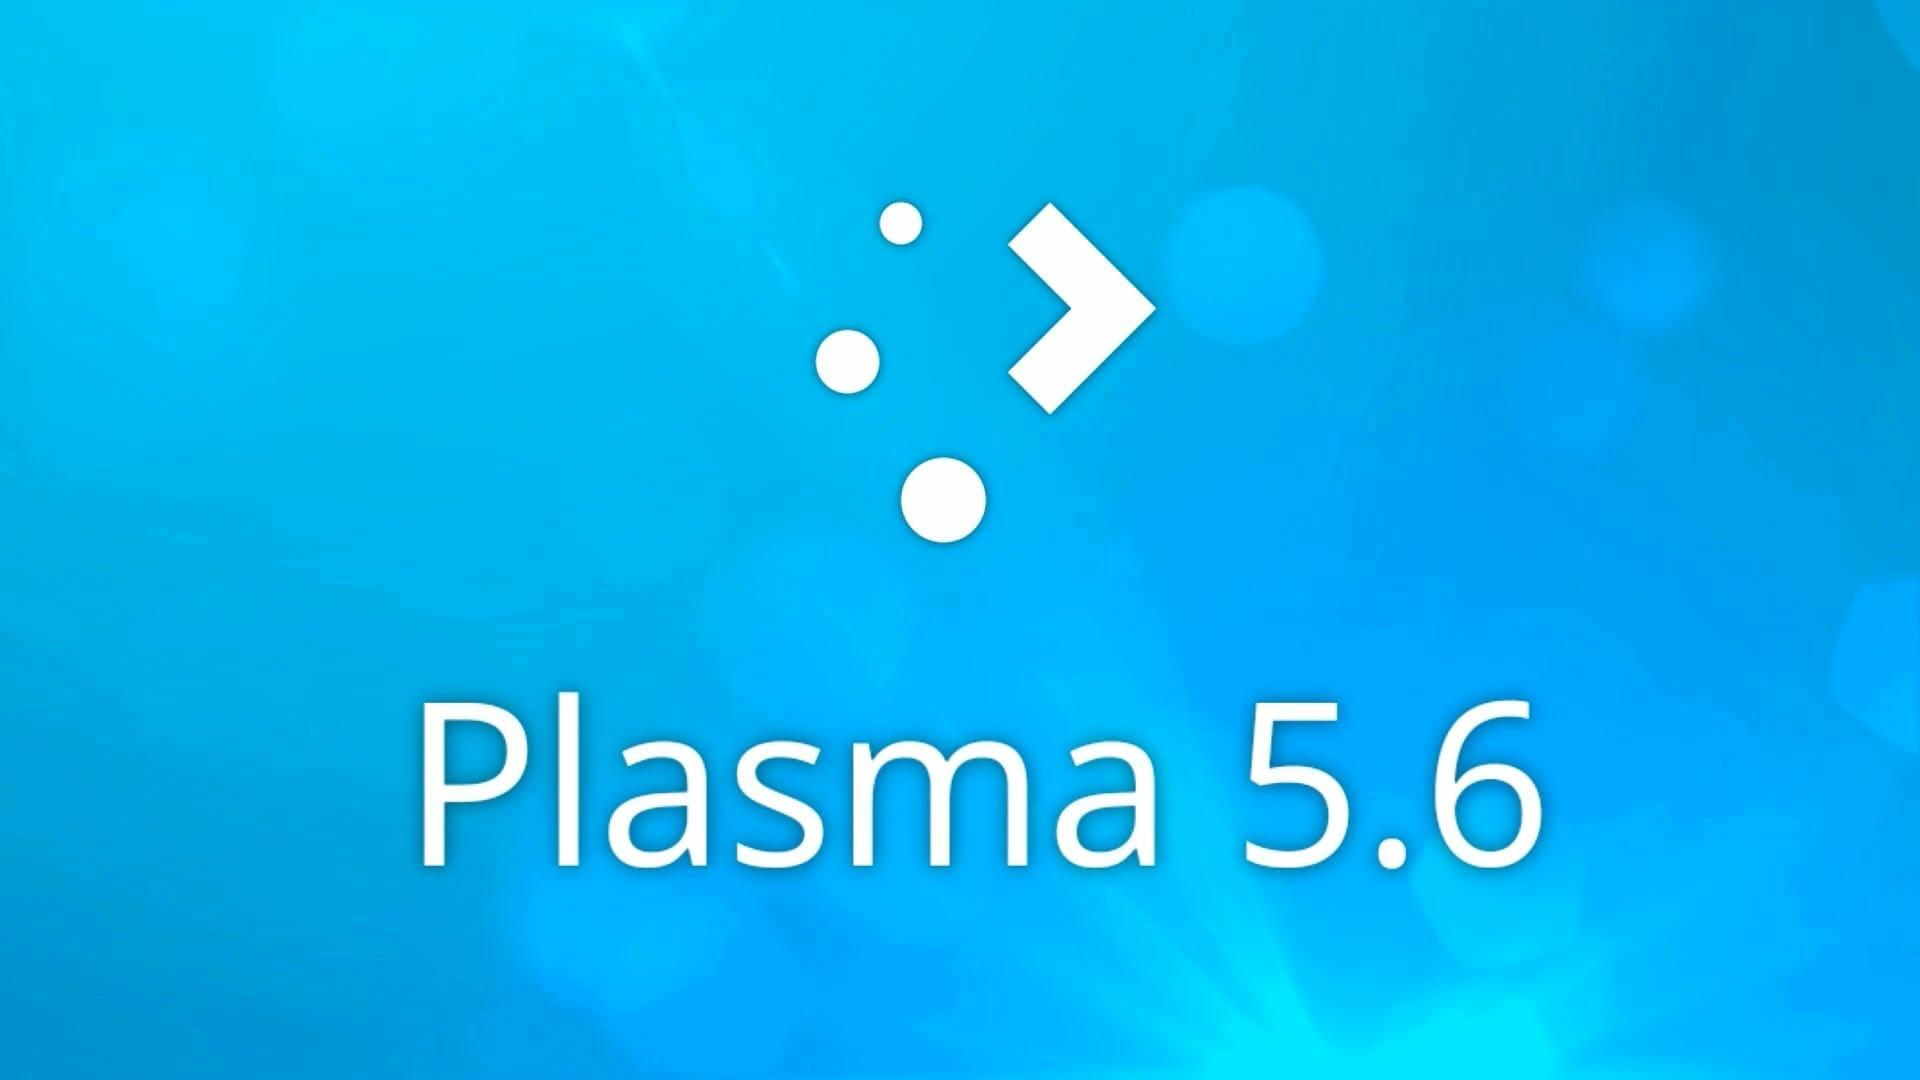 plasma 5.6